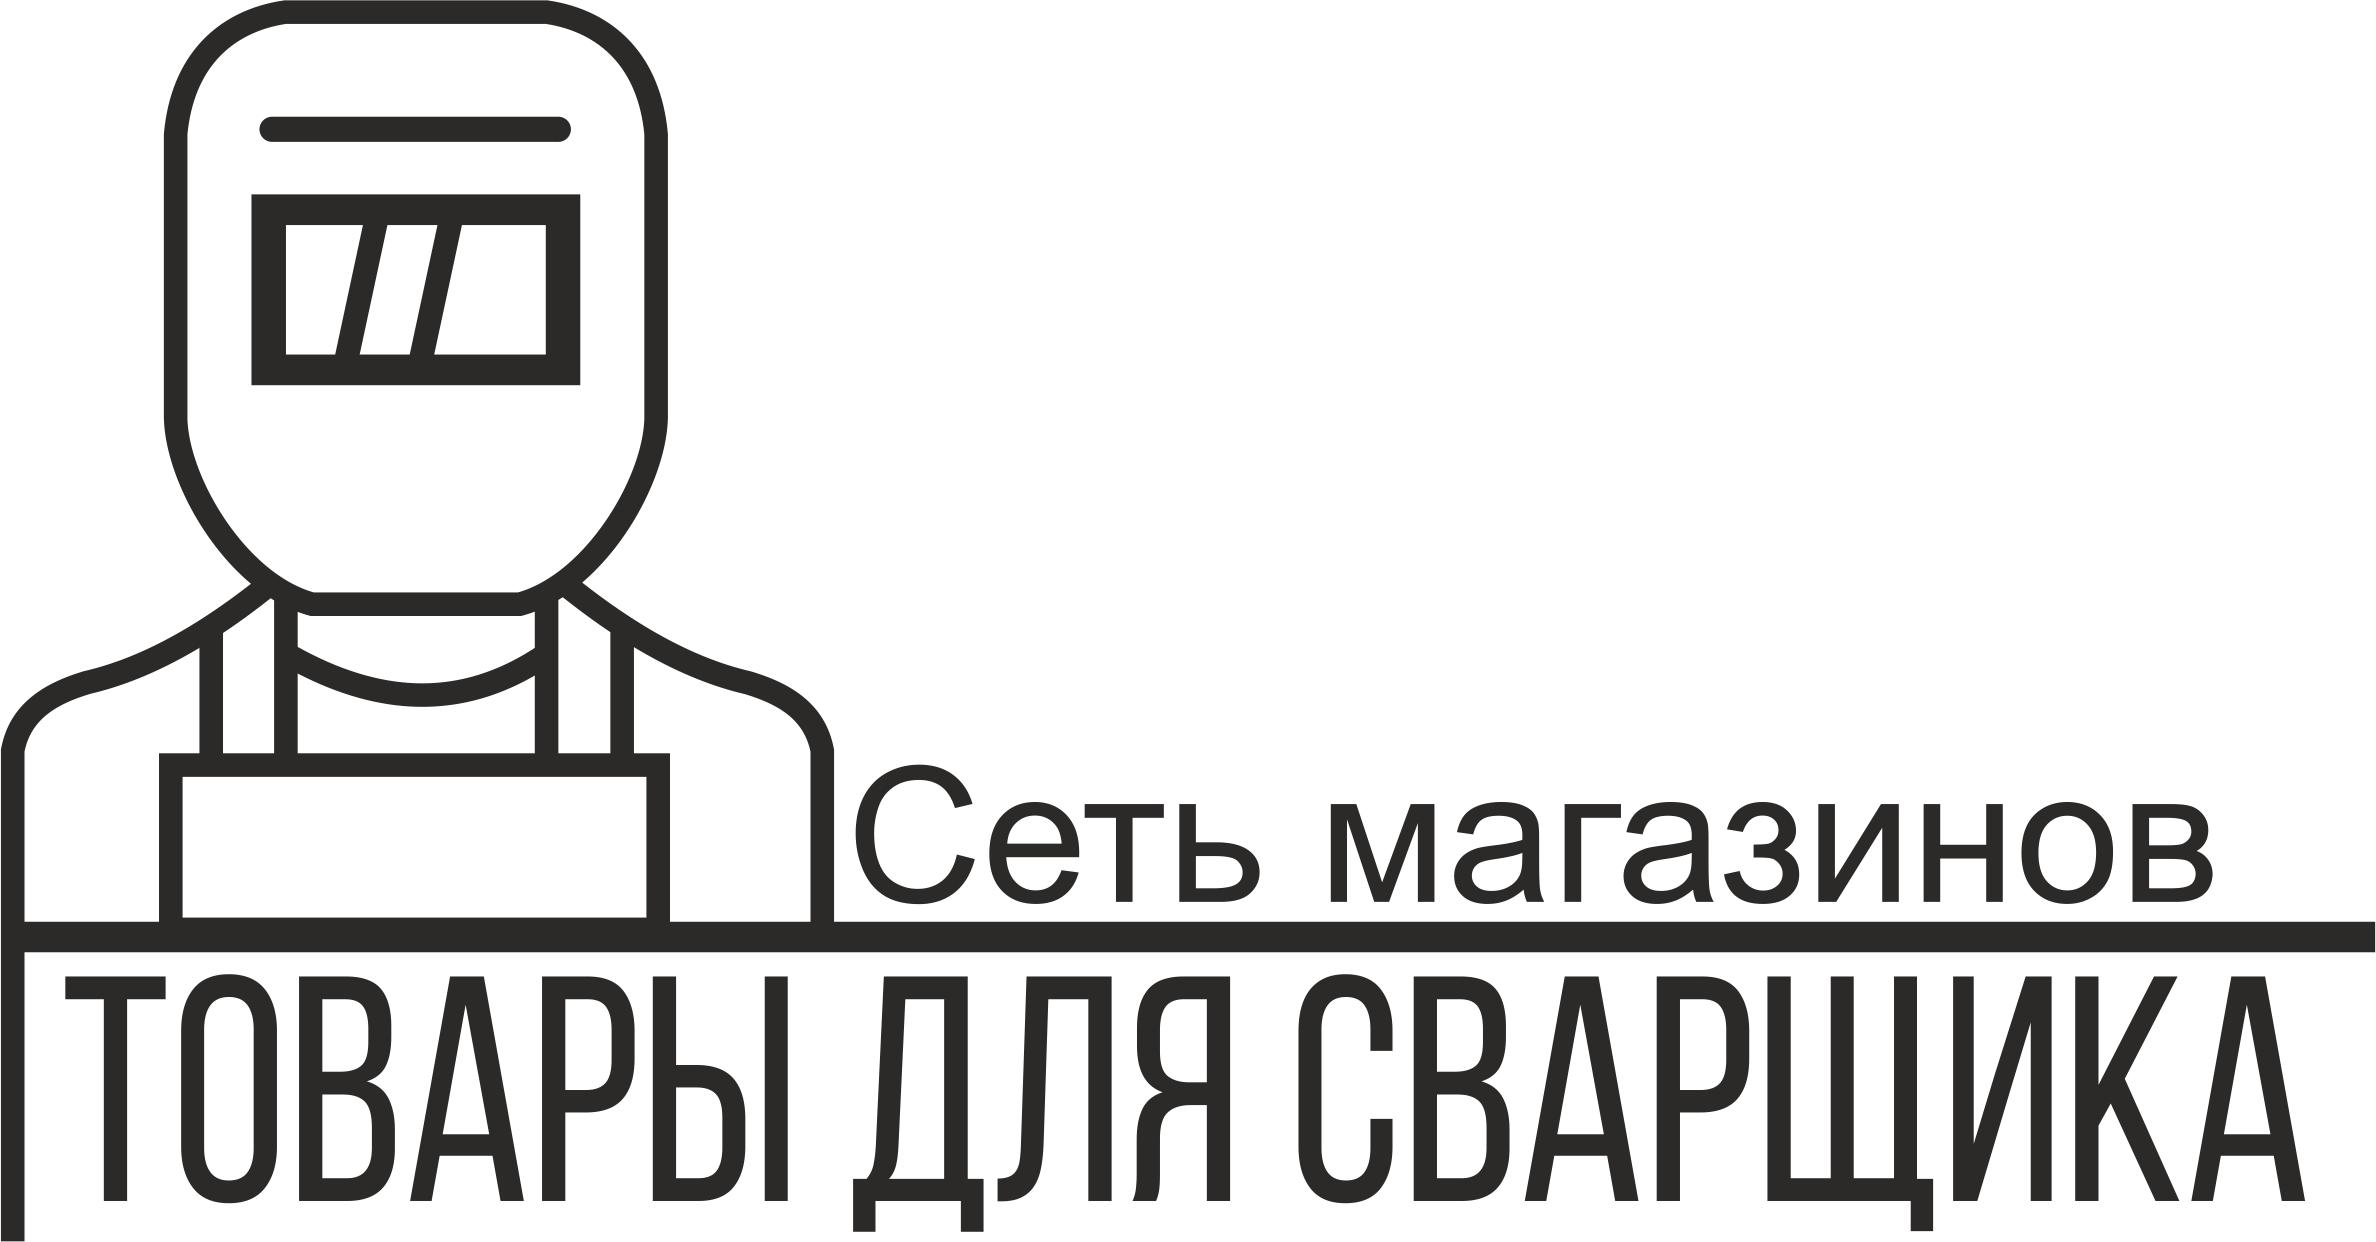 companypic.png